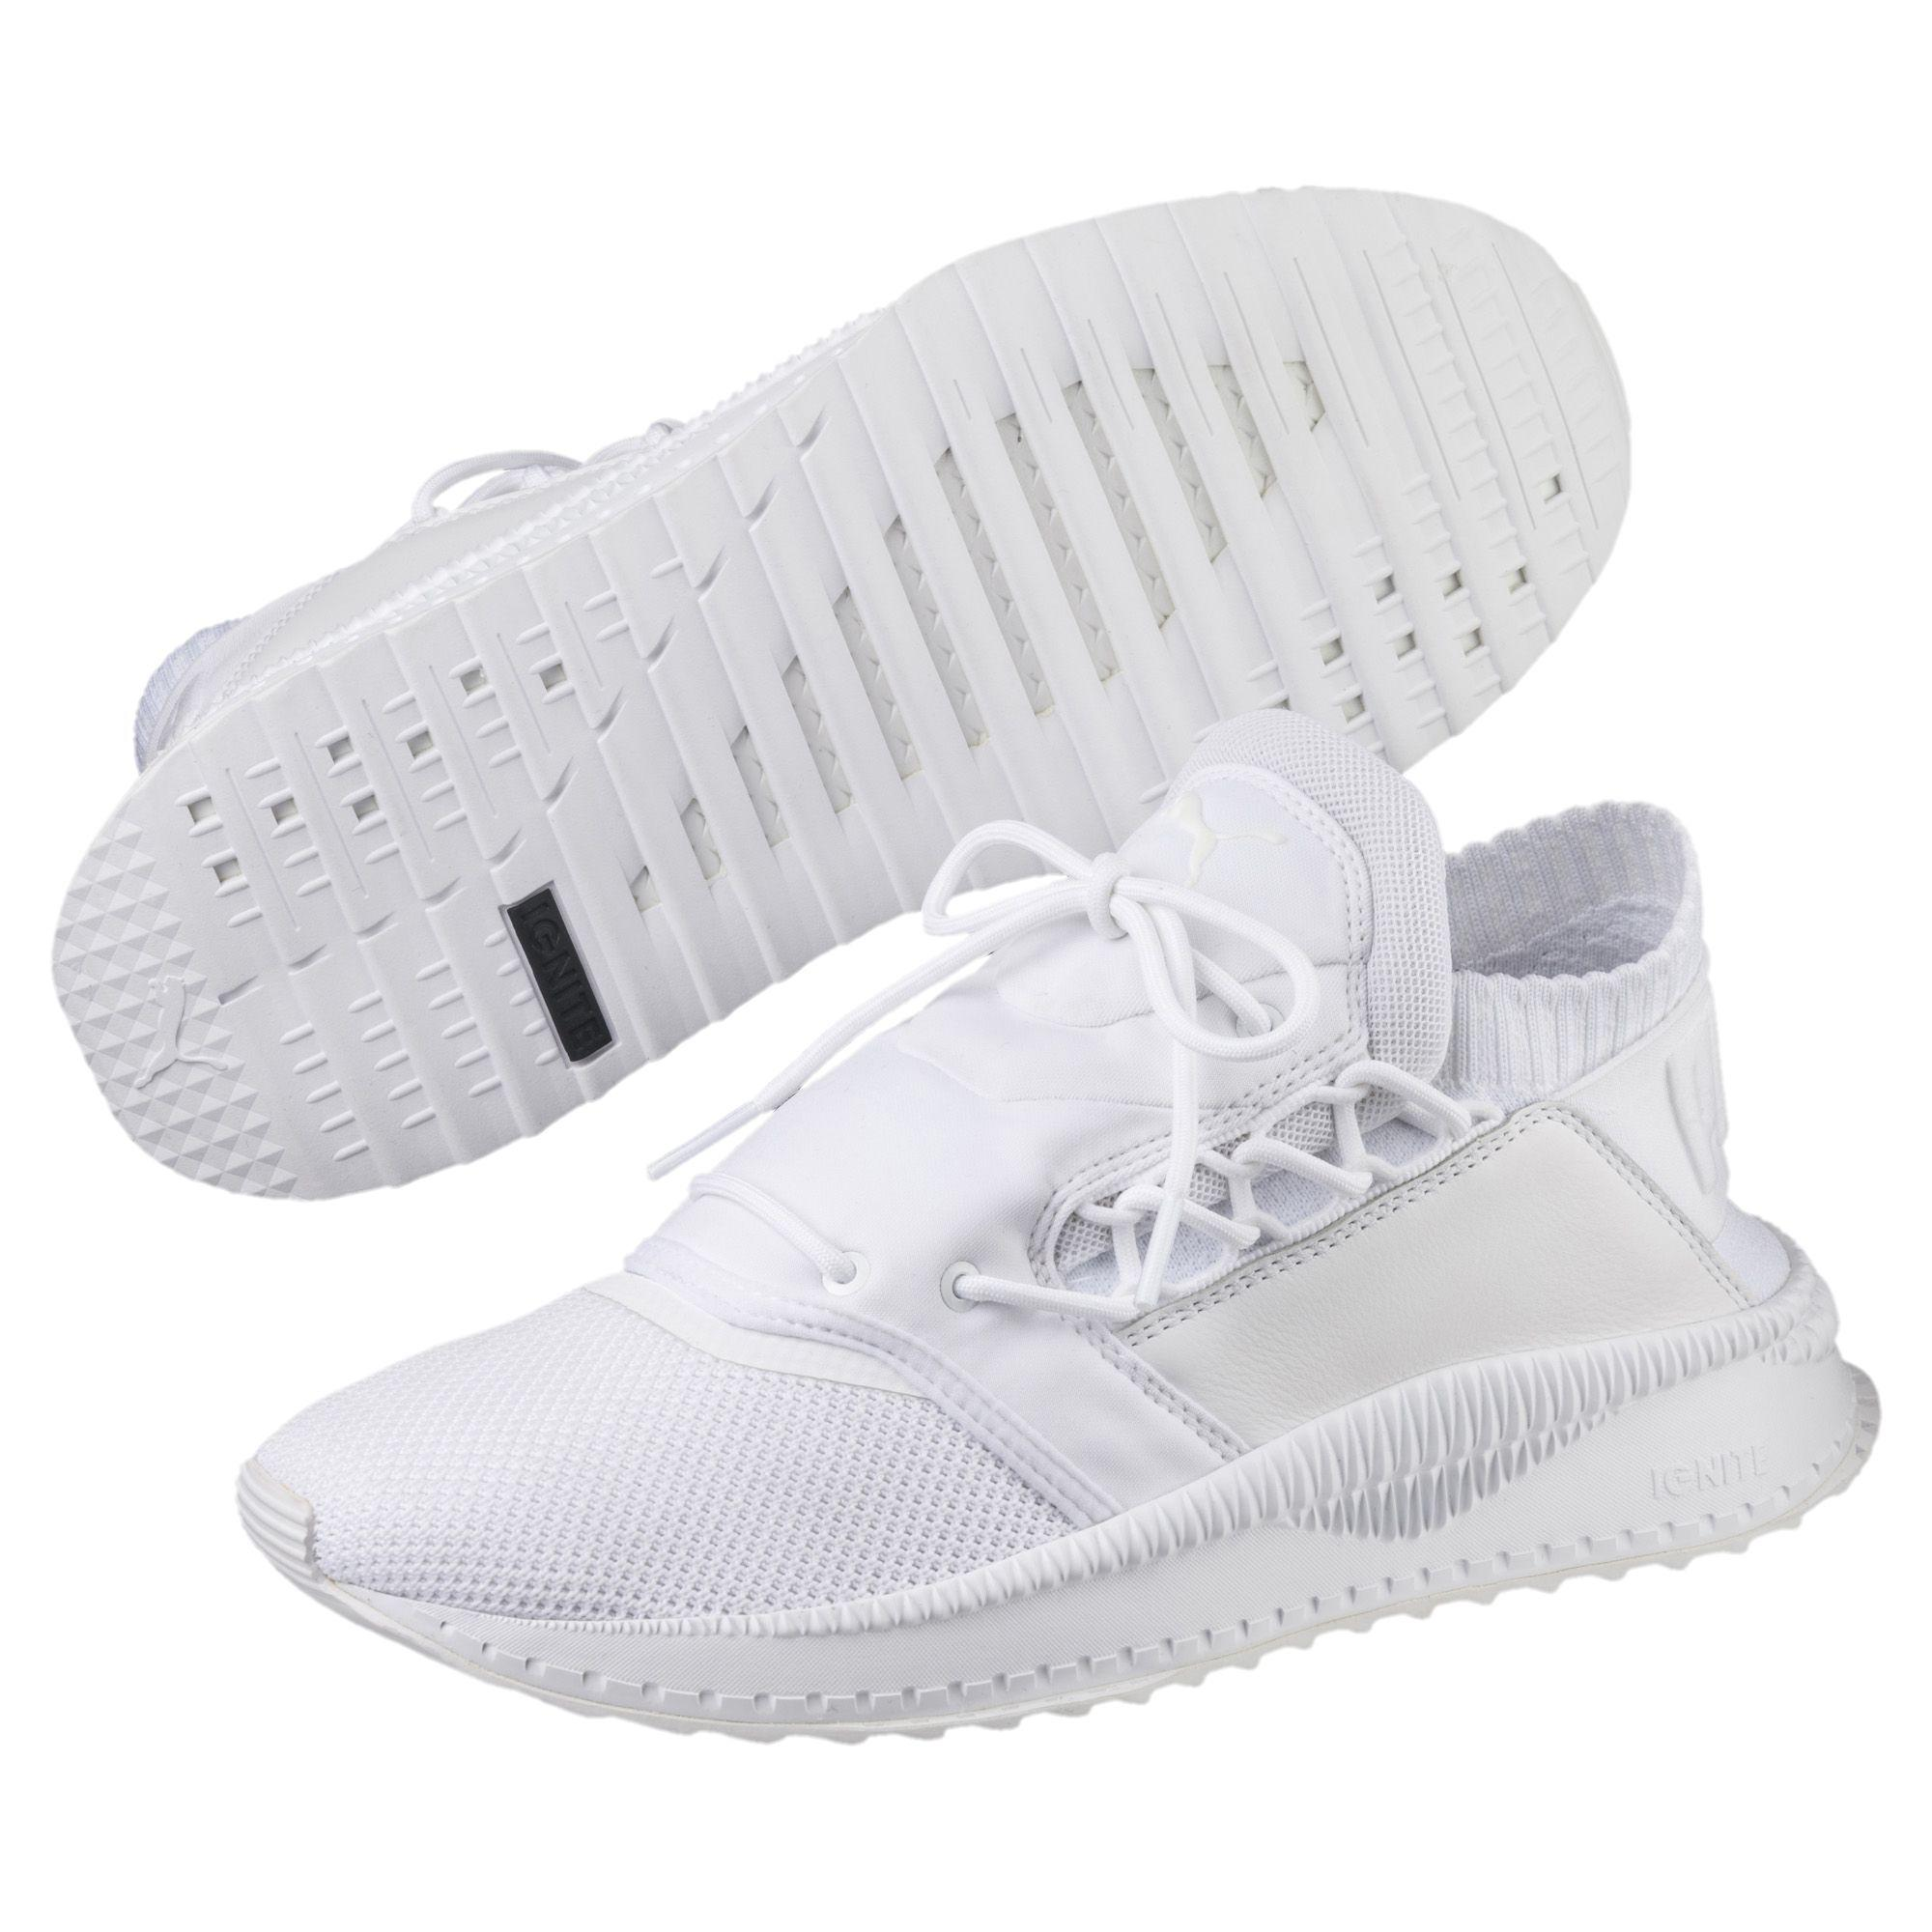 a761031e77f519 Lyst - PUMA Tsugi Shinsei Men s Training Shoes in White for Men